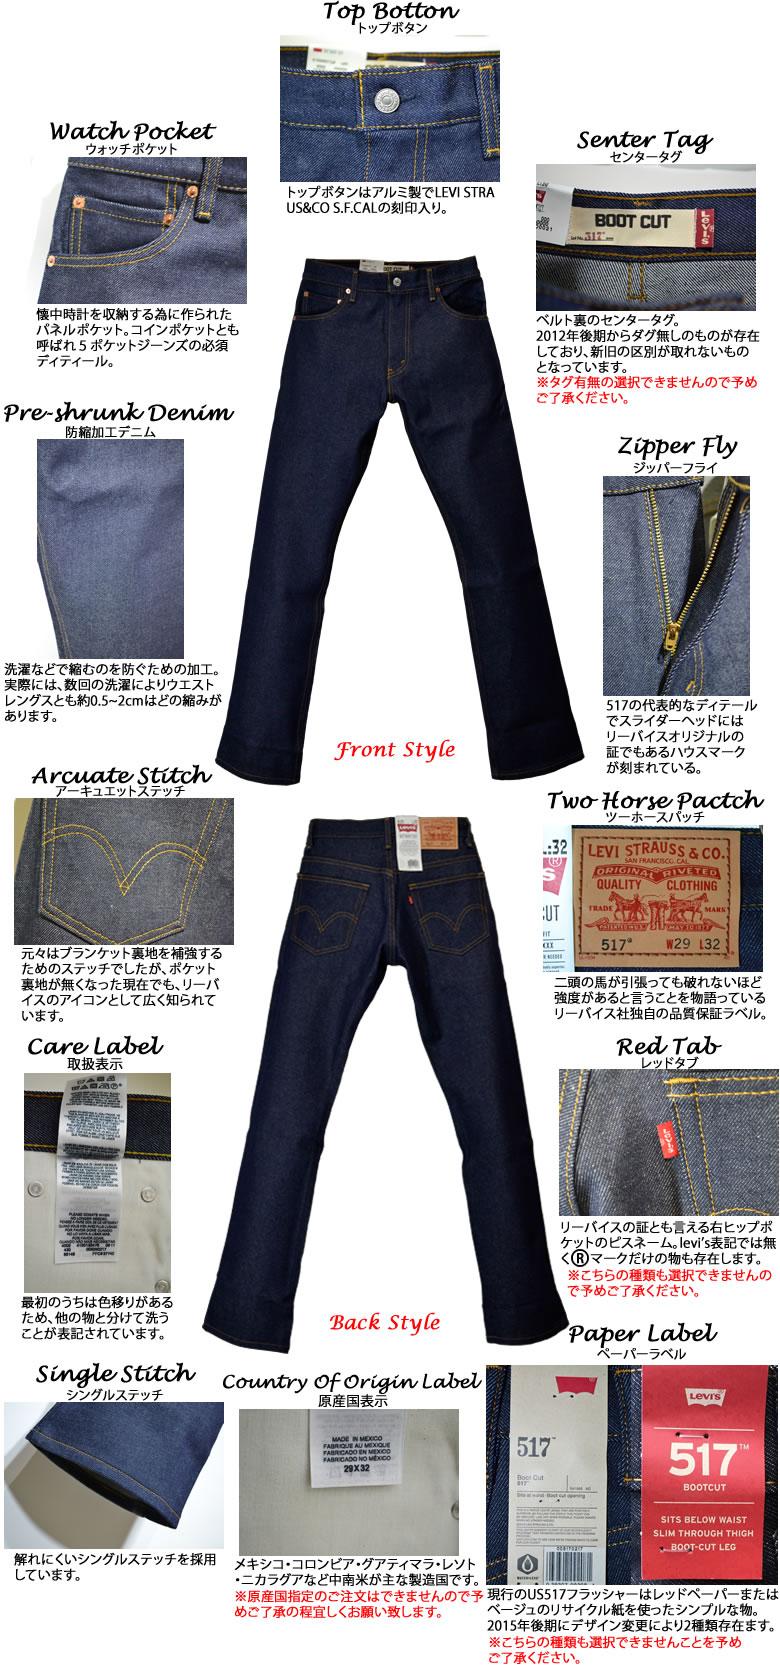 LEVI'S 517 ORIGINAL BOOT CUT denim jeans jeans underwear bootcut 00517 Rigid non-wash